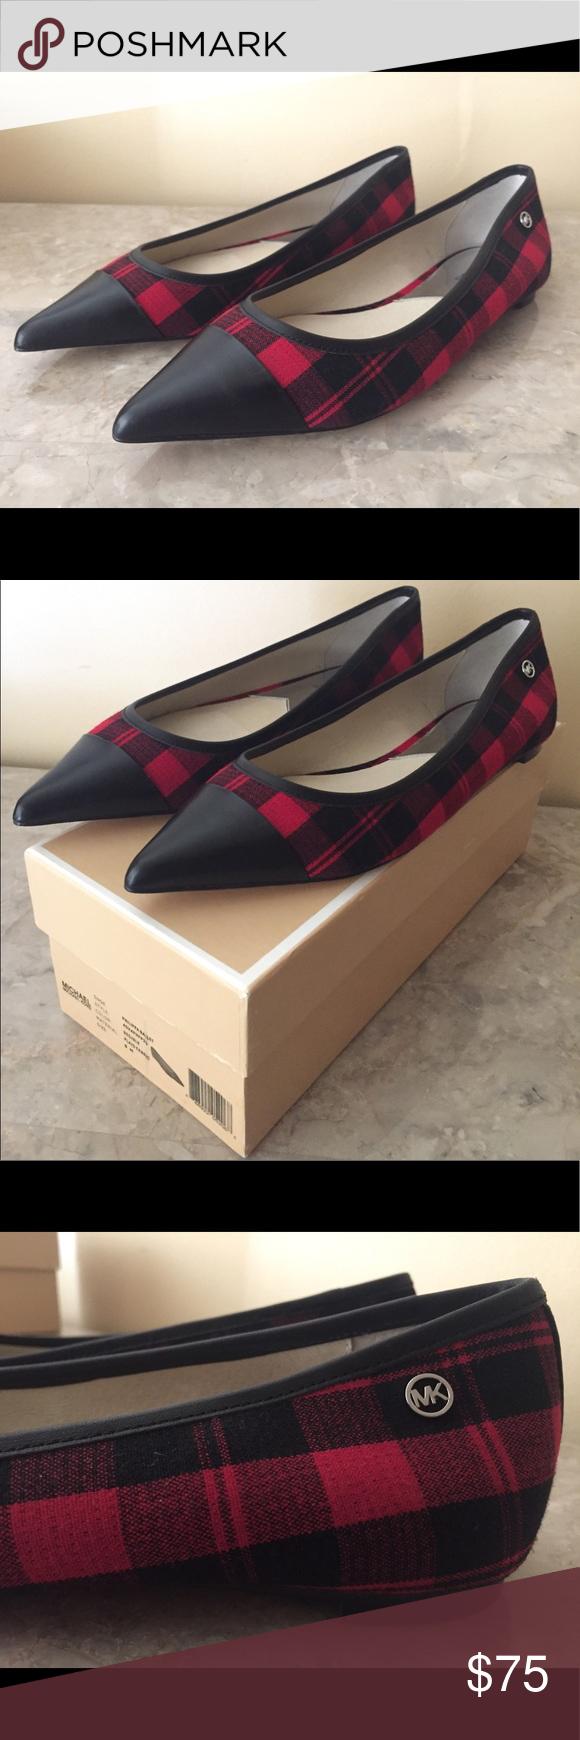 eeef7588b632 NEW  110 Michael Kors Pointed Toe Flats Shoes 100% Authentic Michael Kors  Philippa Ballet Flats